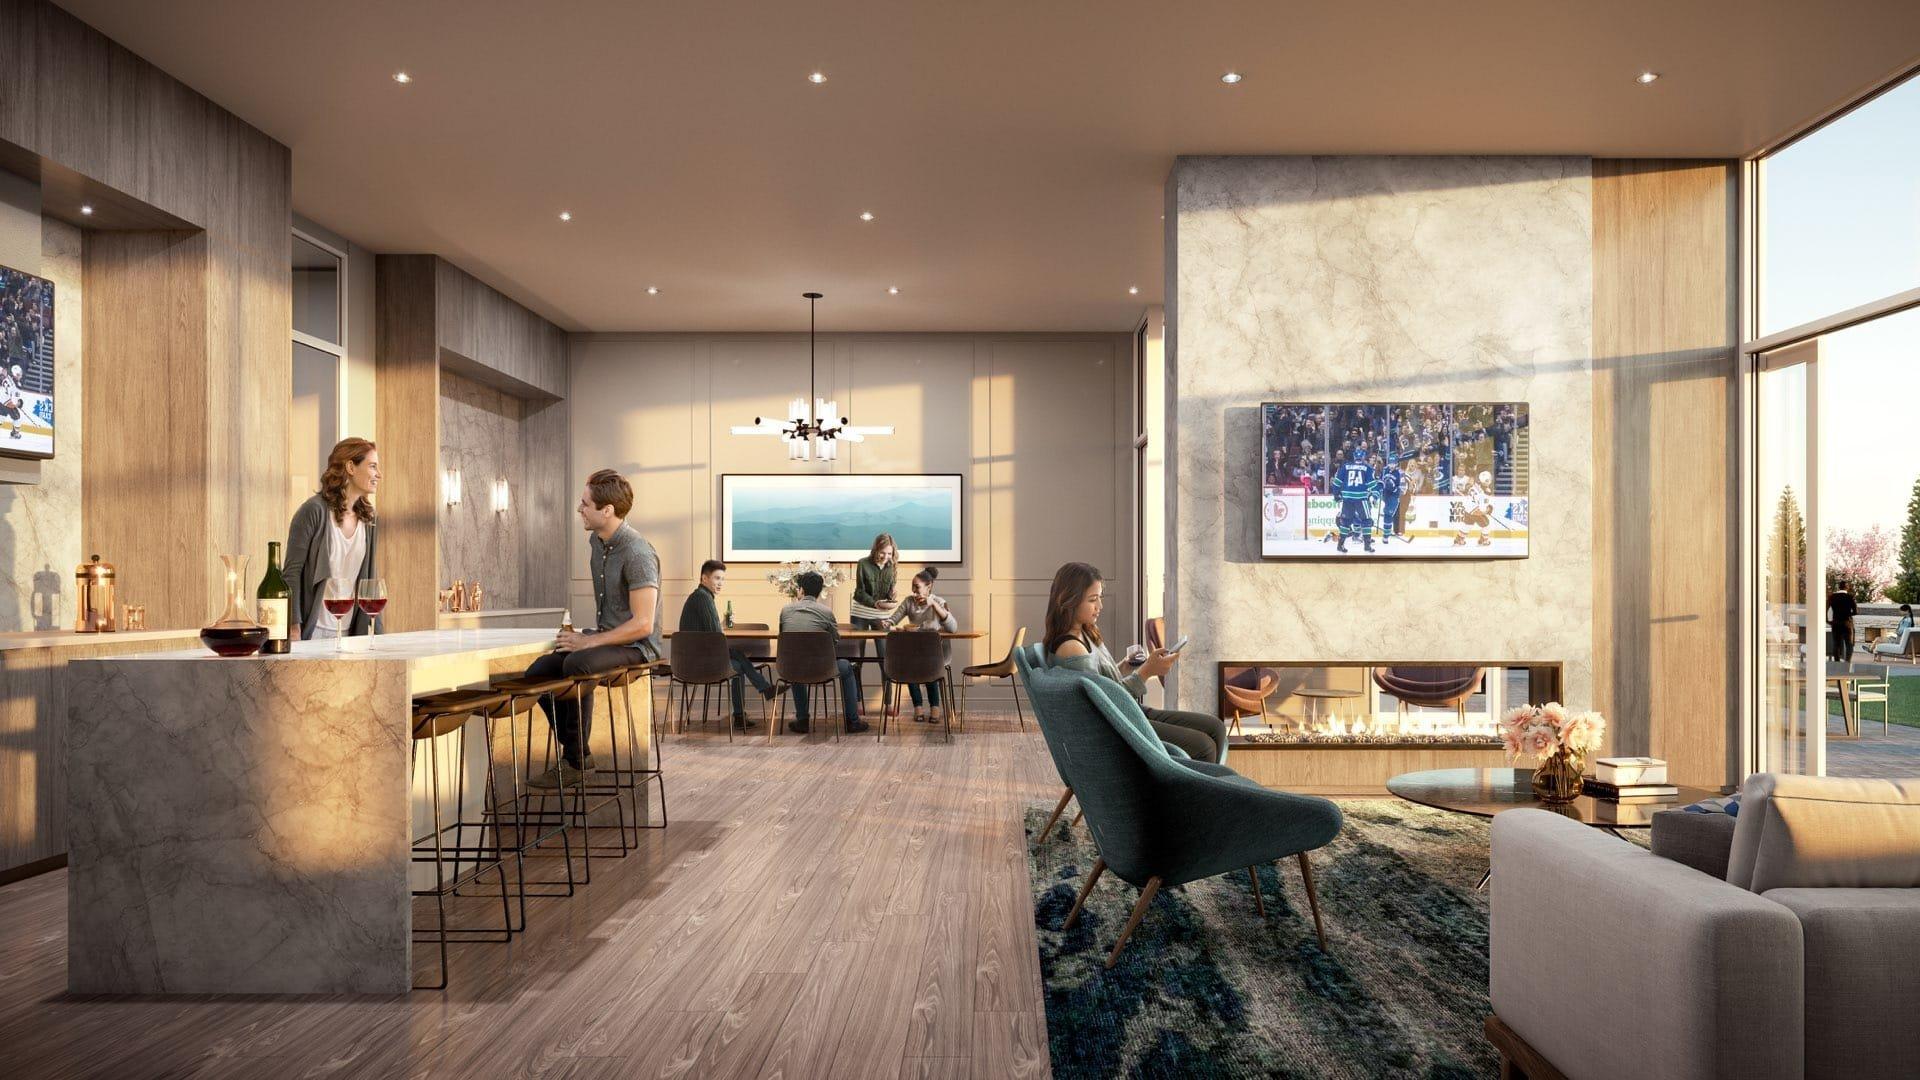 Entertainment Lounge - 1033 Austin Ave, Coquitlam, BC V3K 3P2, Canada!